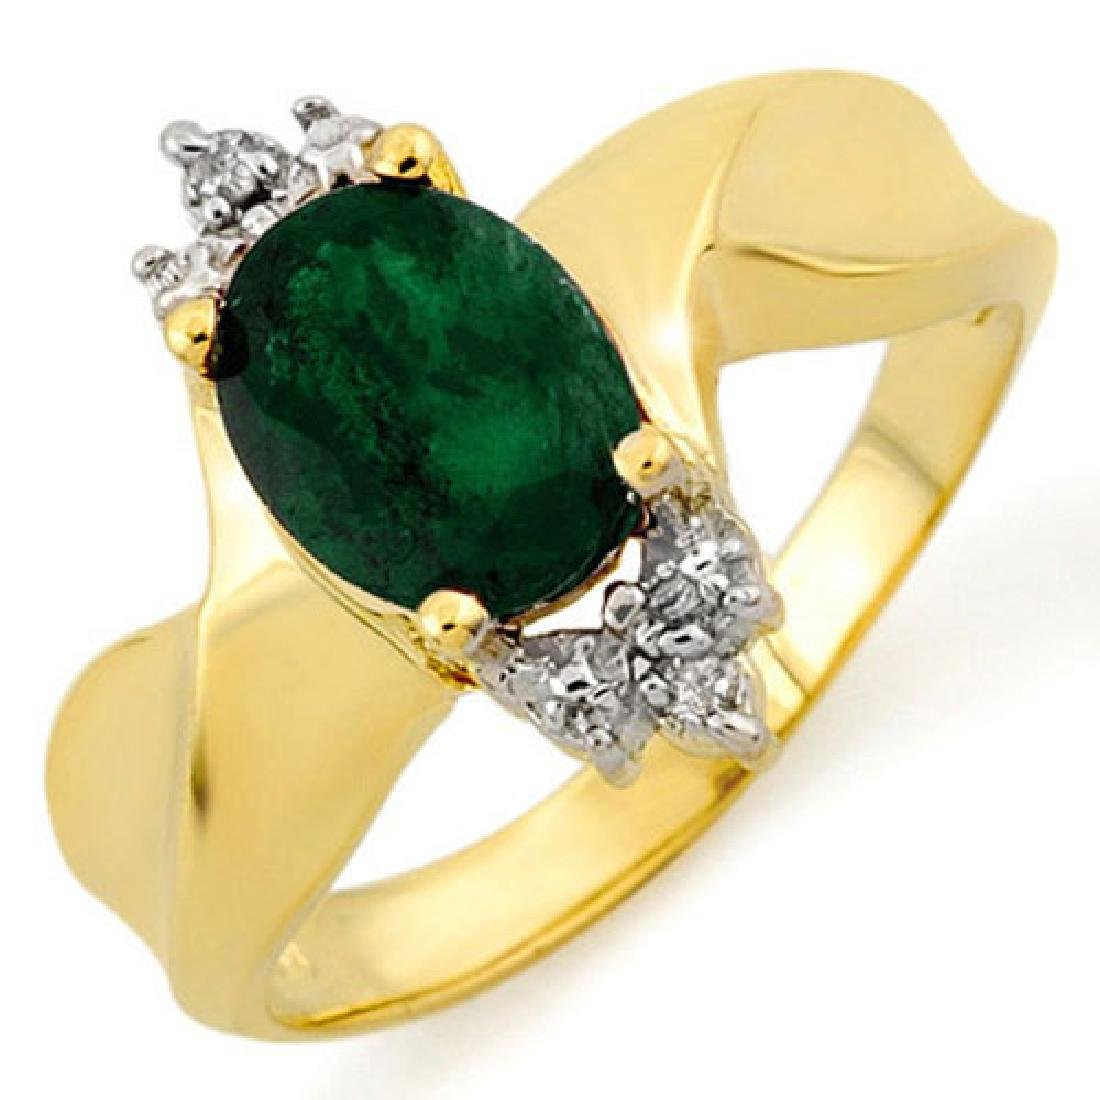 1.29 CTW Emerald & Diamond Ring 10K Yellow Gold